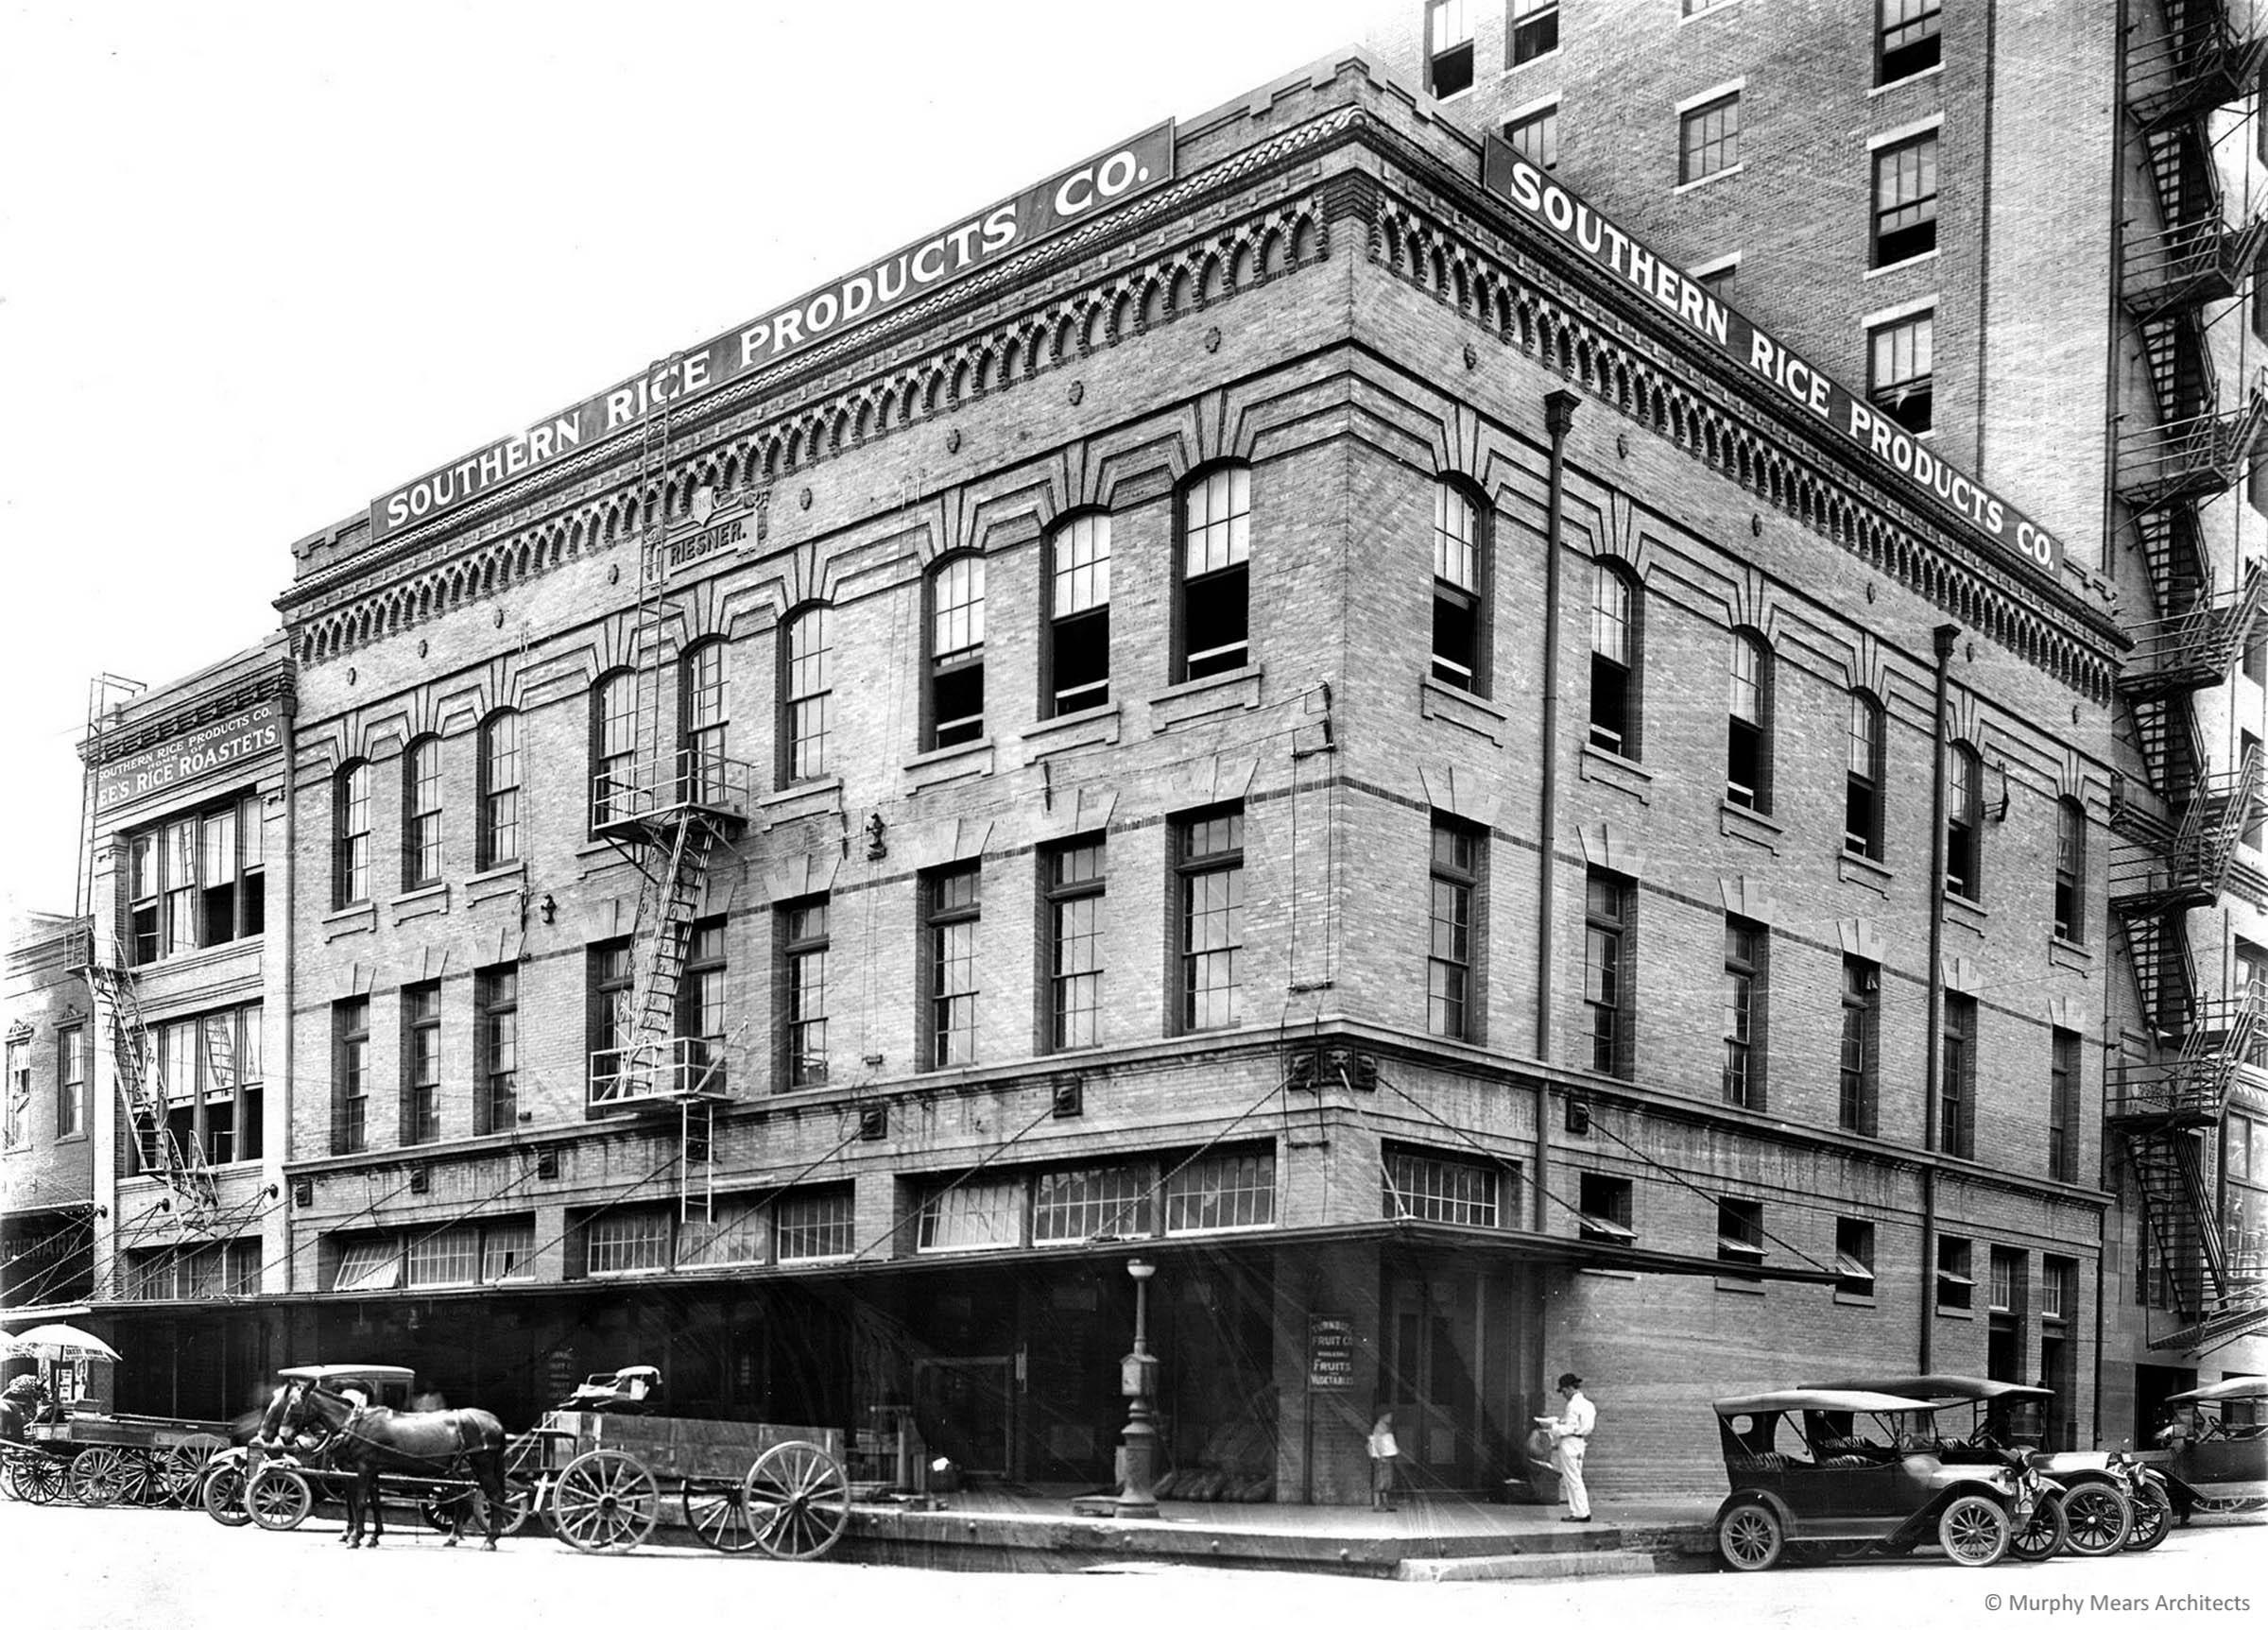 Architecture Center Houston - Riesner Building original historic exterior.